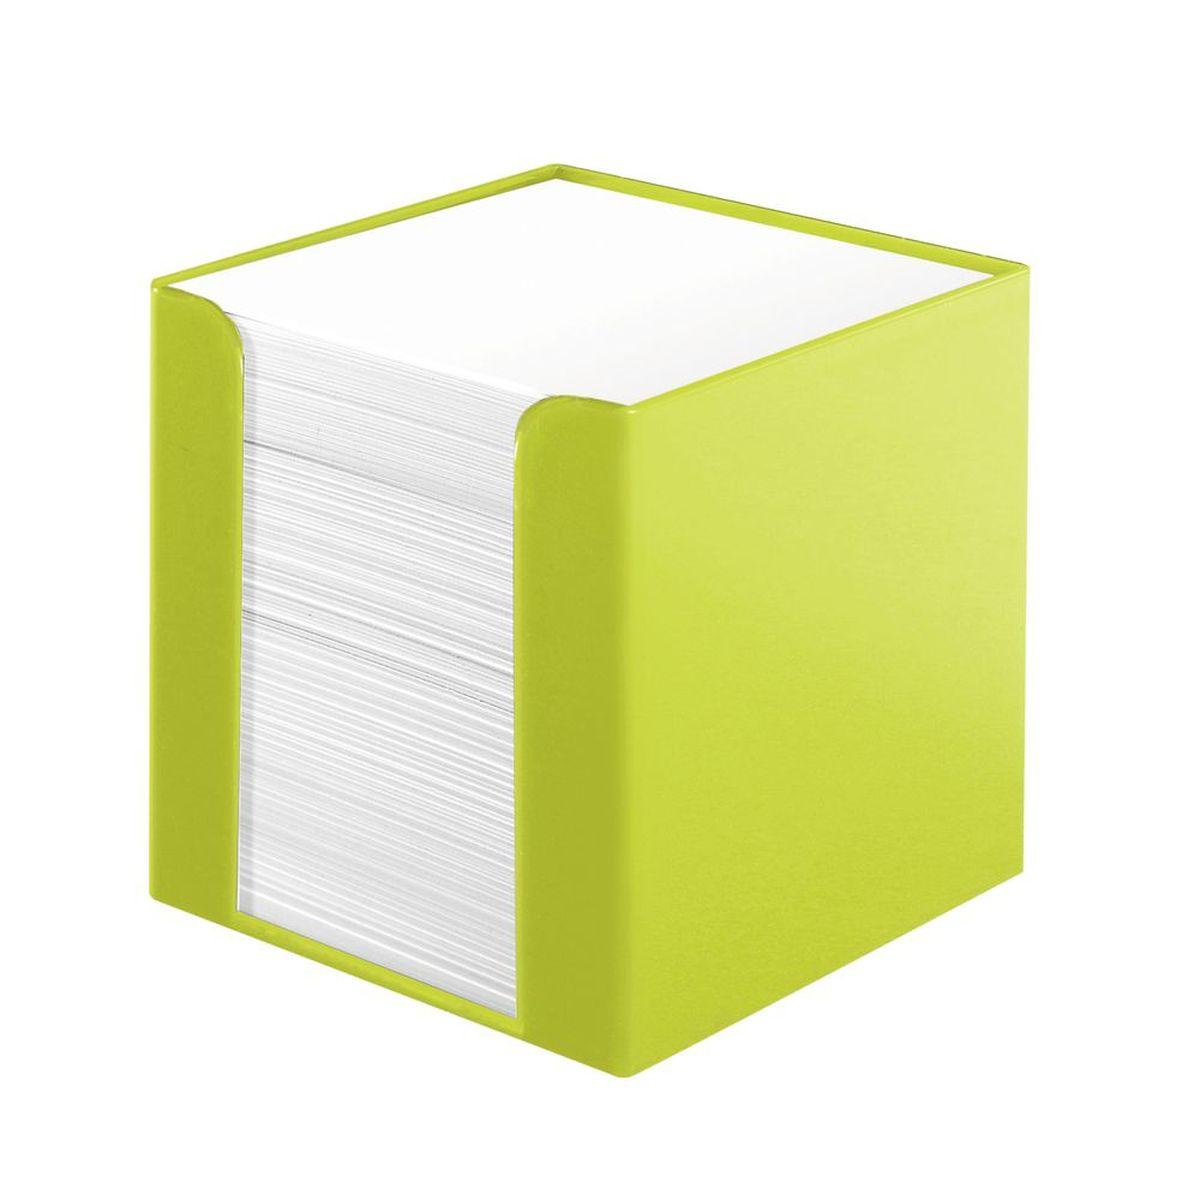 Herlitz Бумага для заметок Colour Blocking цвет подставки лимонный -  Бумага для заметок, стикеры, закладки